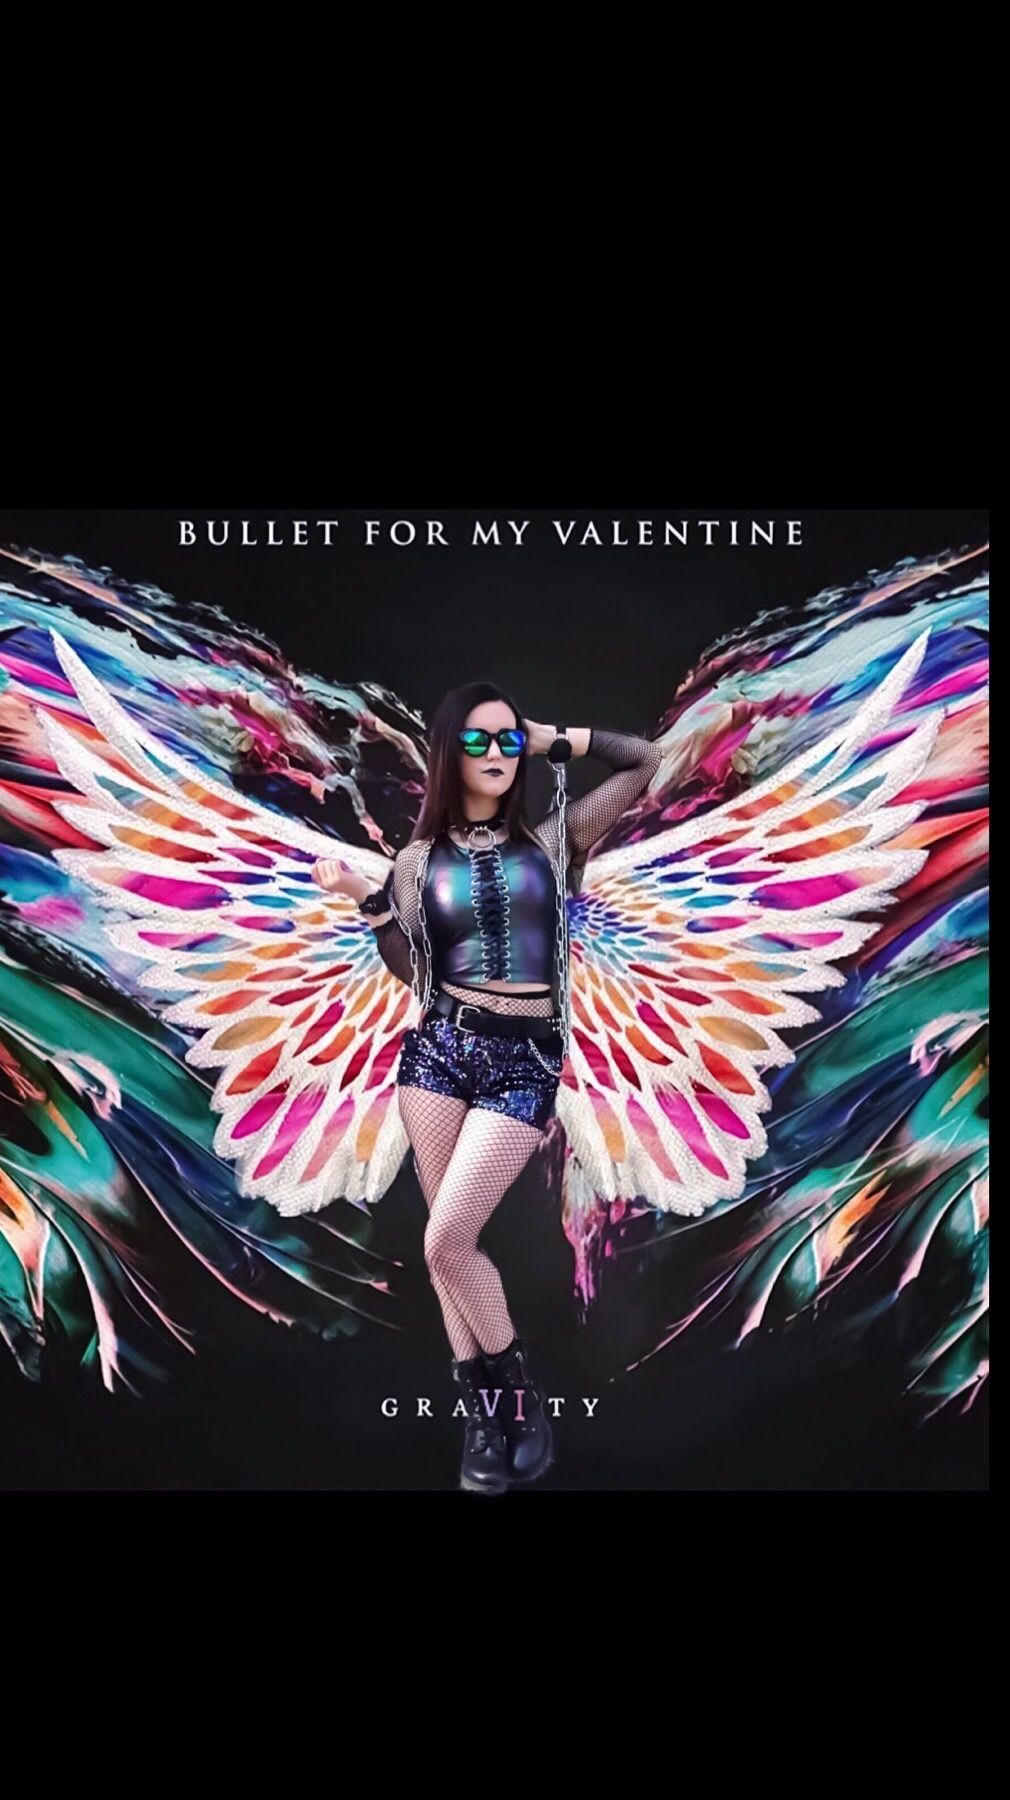 Bfmv Bulletformyvalentine Metalband Band Albumcover Metalcore Bandlove Gravity Wings Coverart Ed Heavy Metal Music Cover Art Bullet For My Valentine